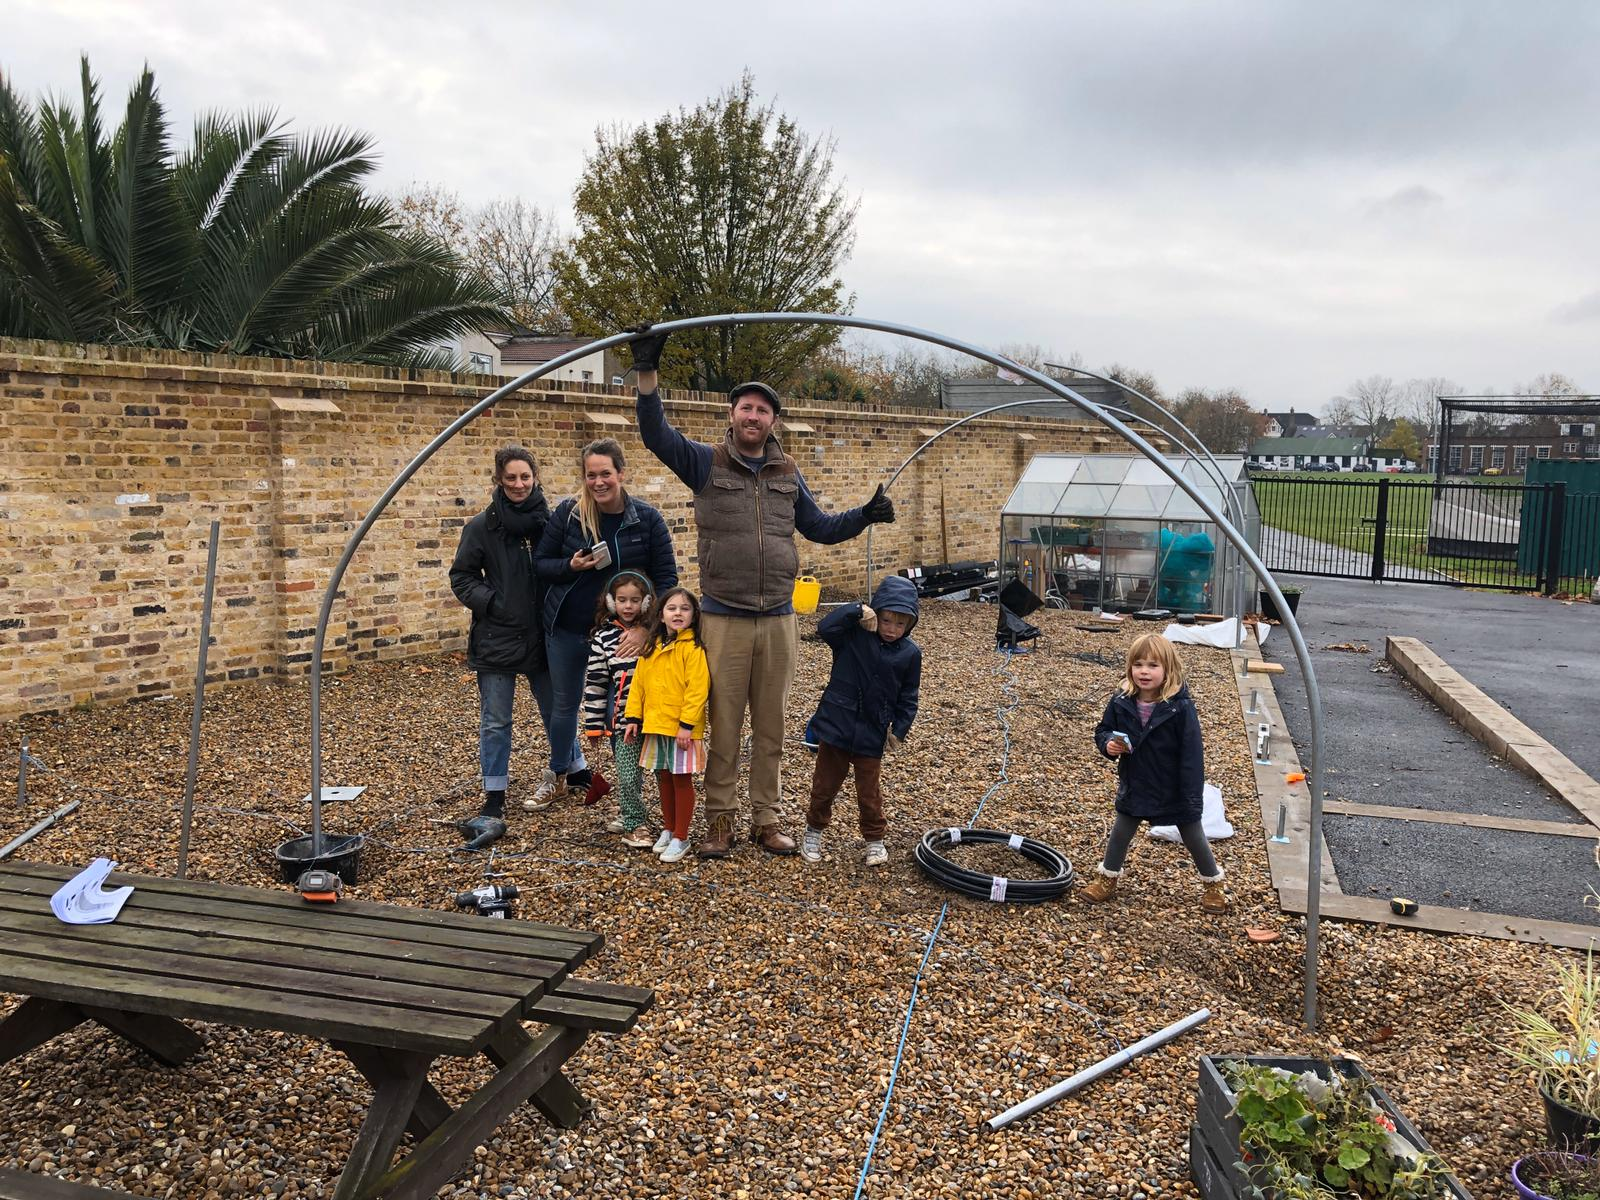 Leyton Boundary Community Garden